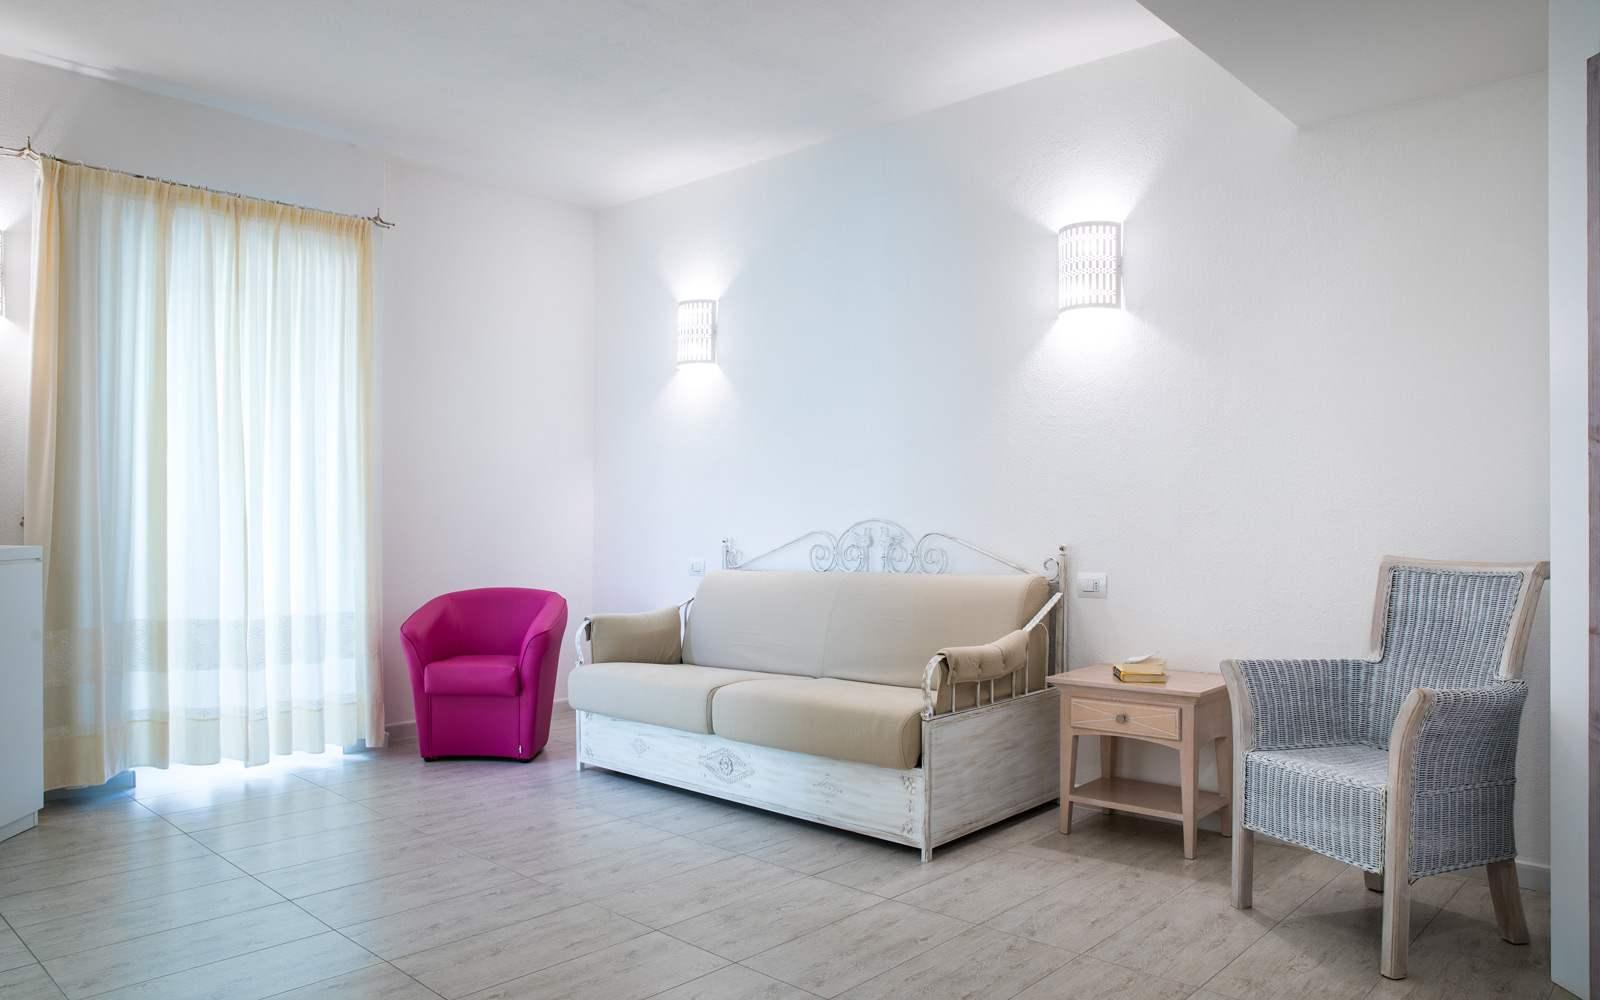 Hotel Flamingo Executive Family Room